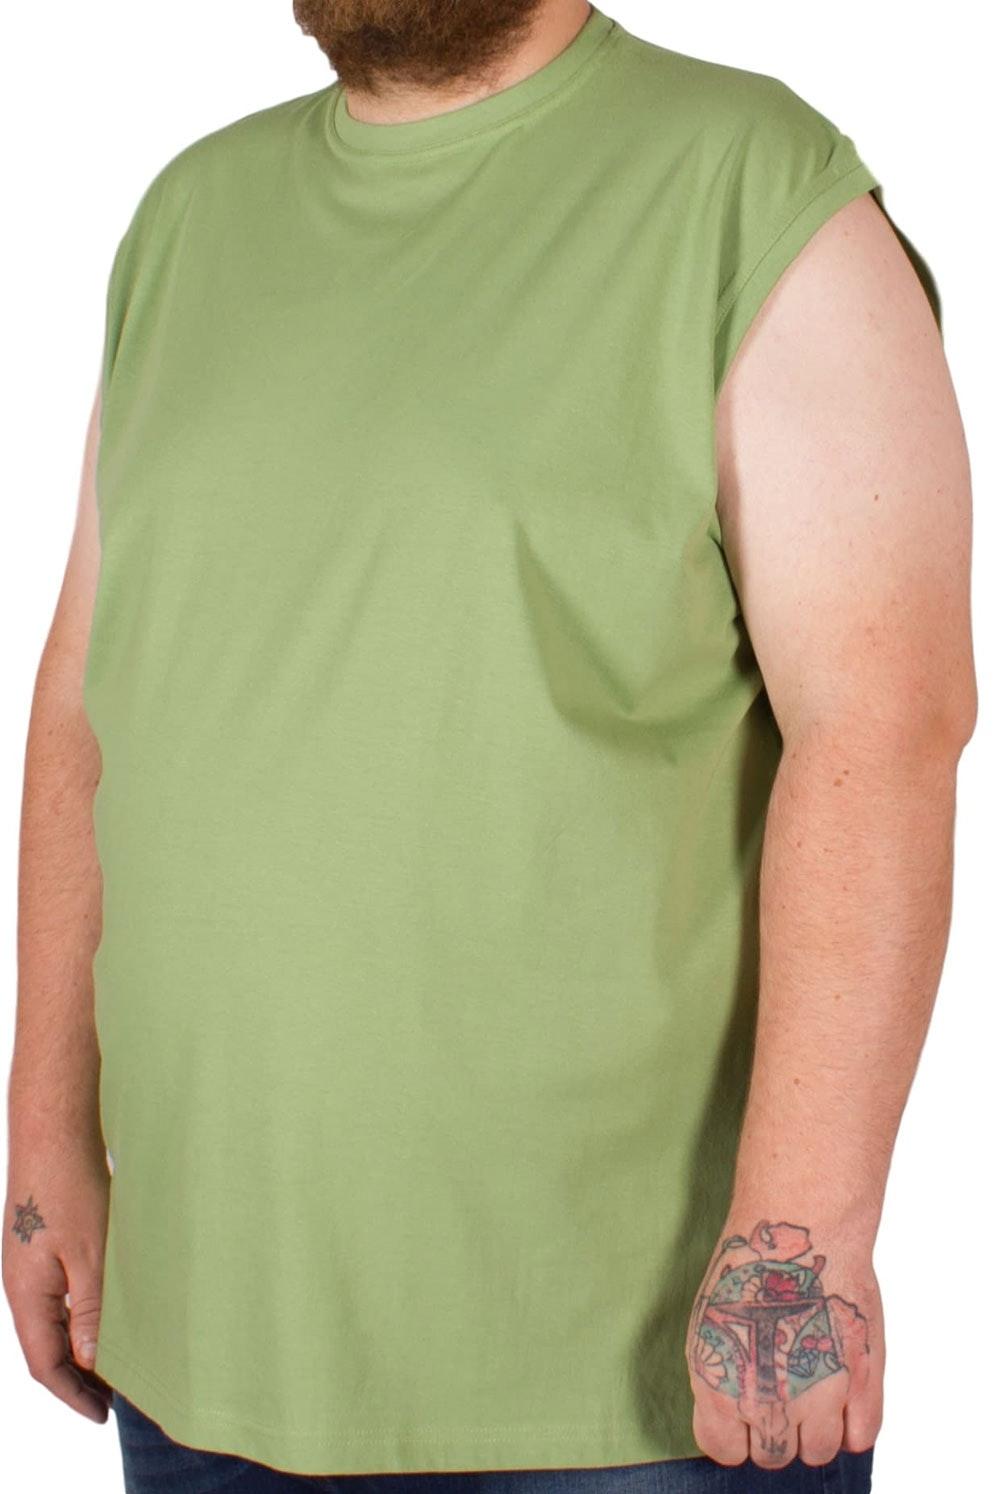 Metaphor Sleeveless T-Shirt Green